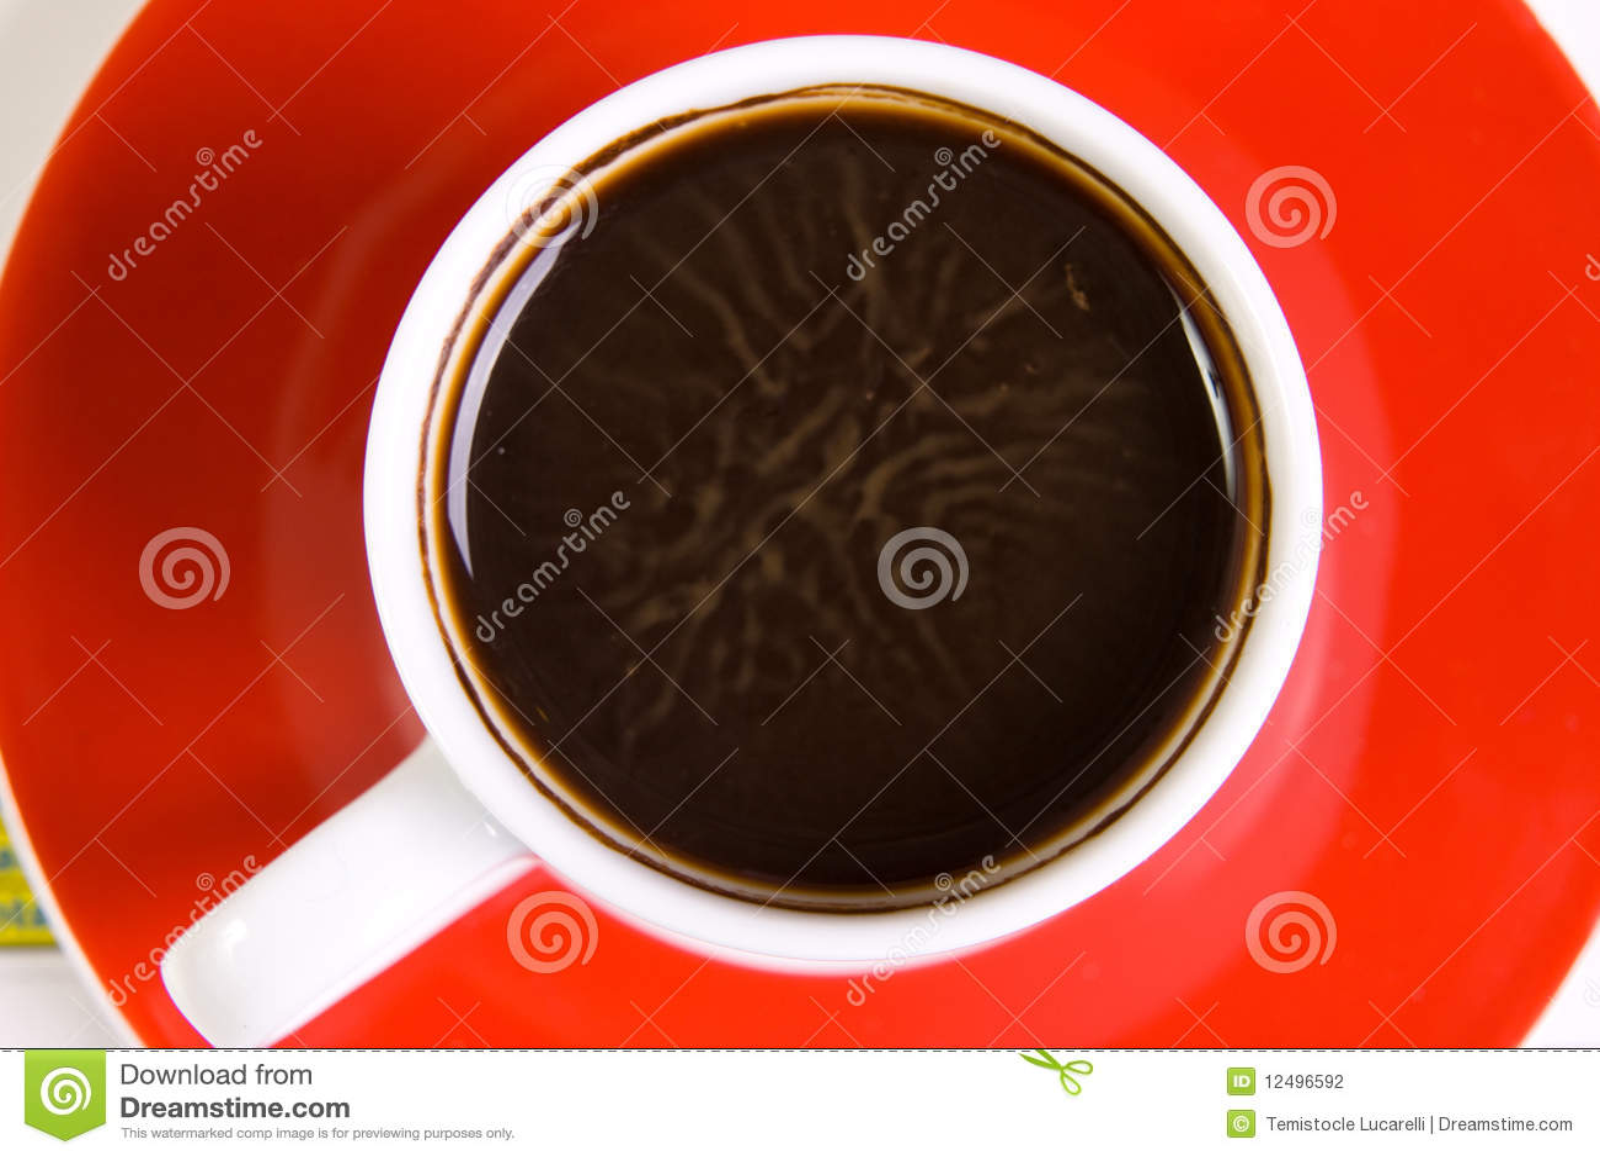 coffee break stock photography image 12496592. Black Bedroom Furniture Sets. Home Design Ideas